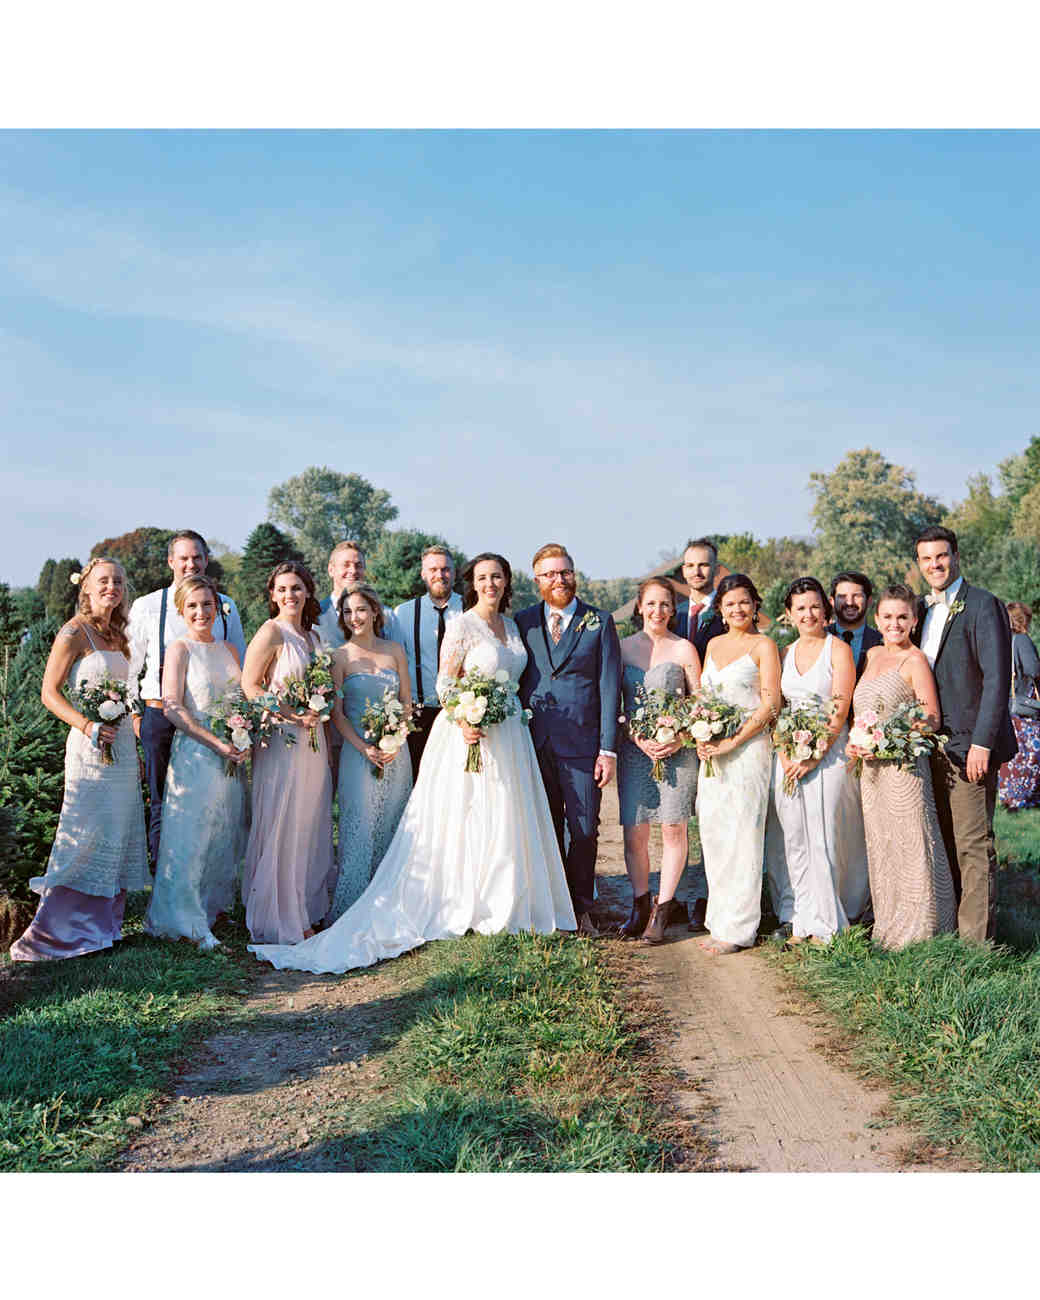 rachel elijah wedding entire bridal party